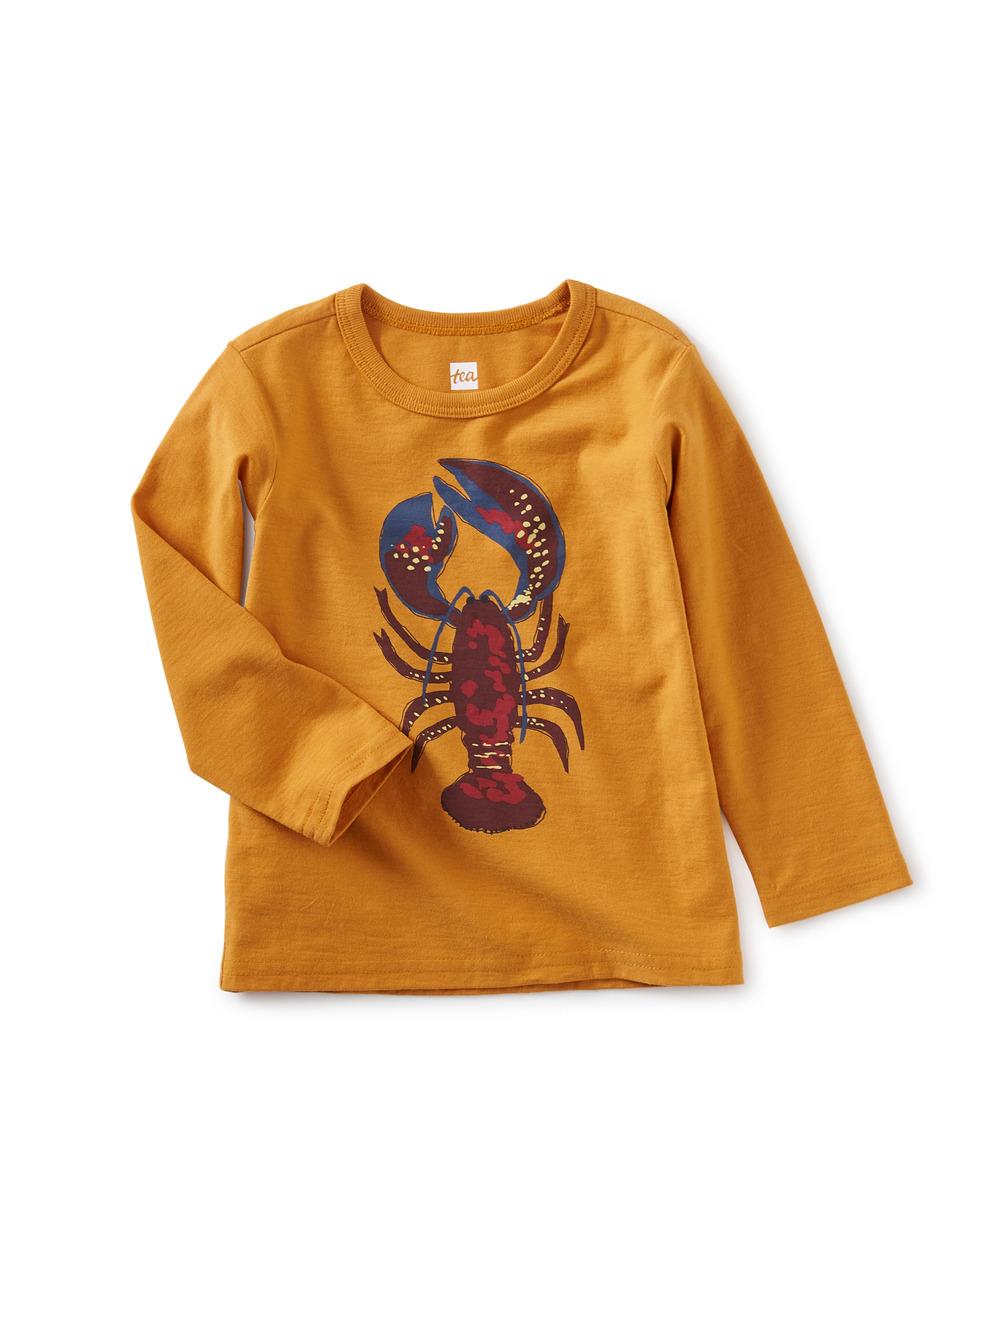 Li'l Lobster Baby Graphic Tee